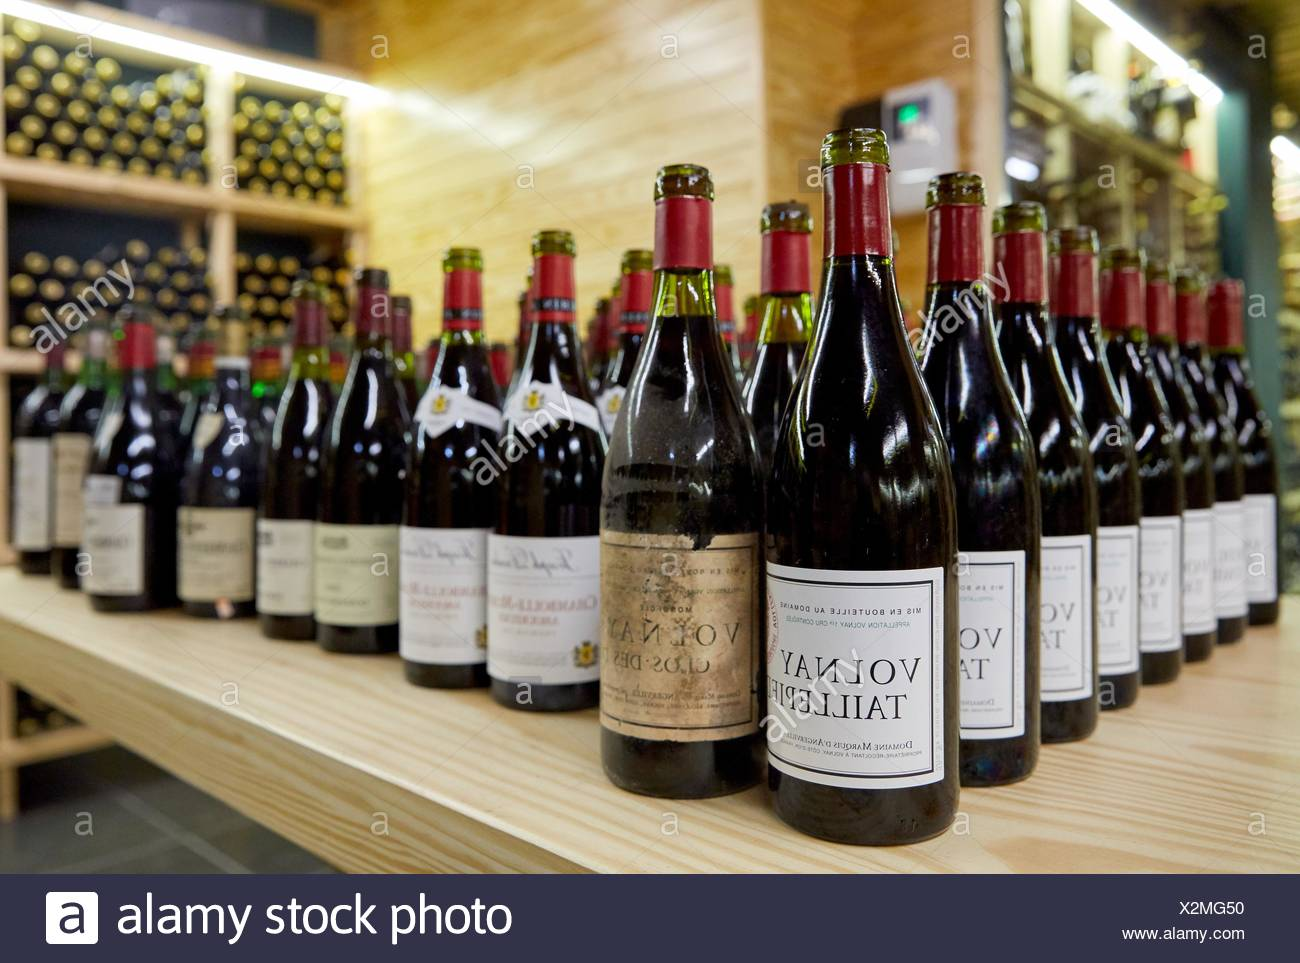 Wine selection, Cellar - Stock Image